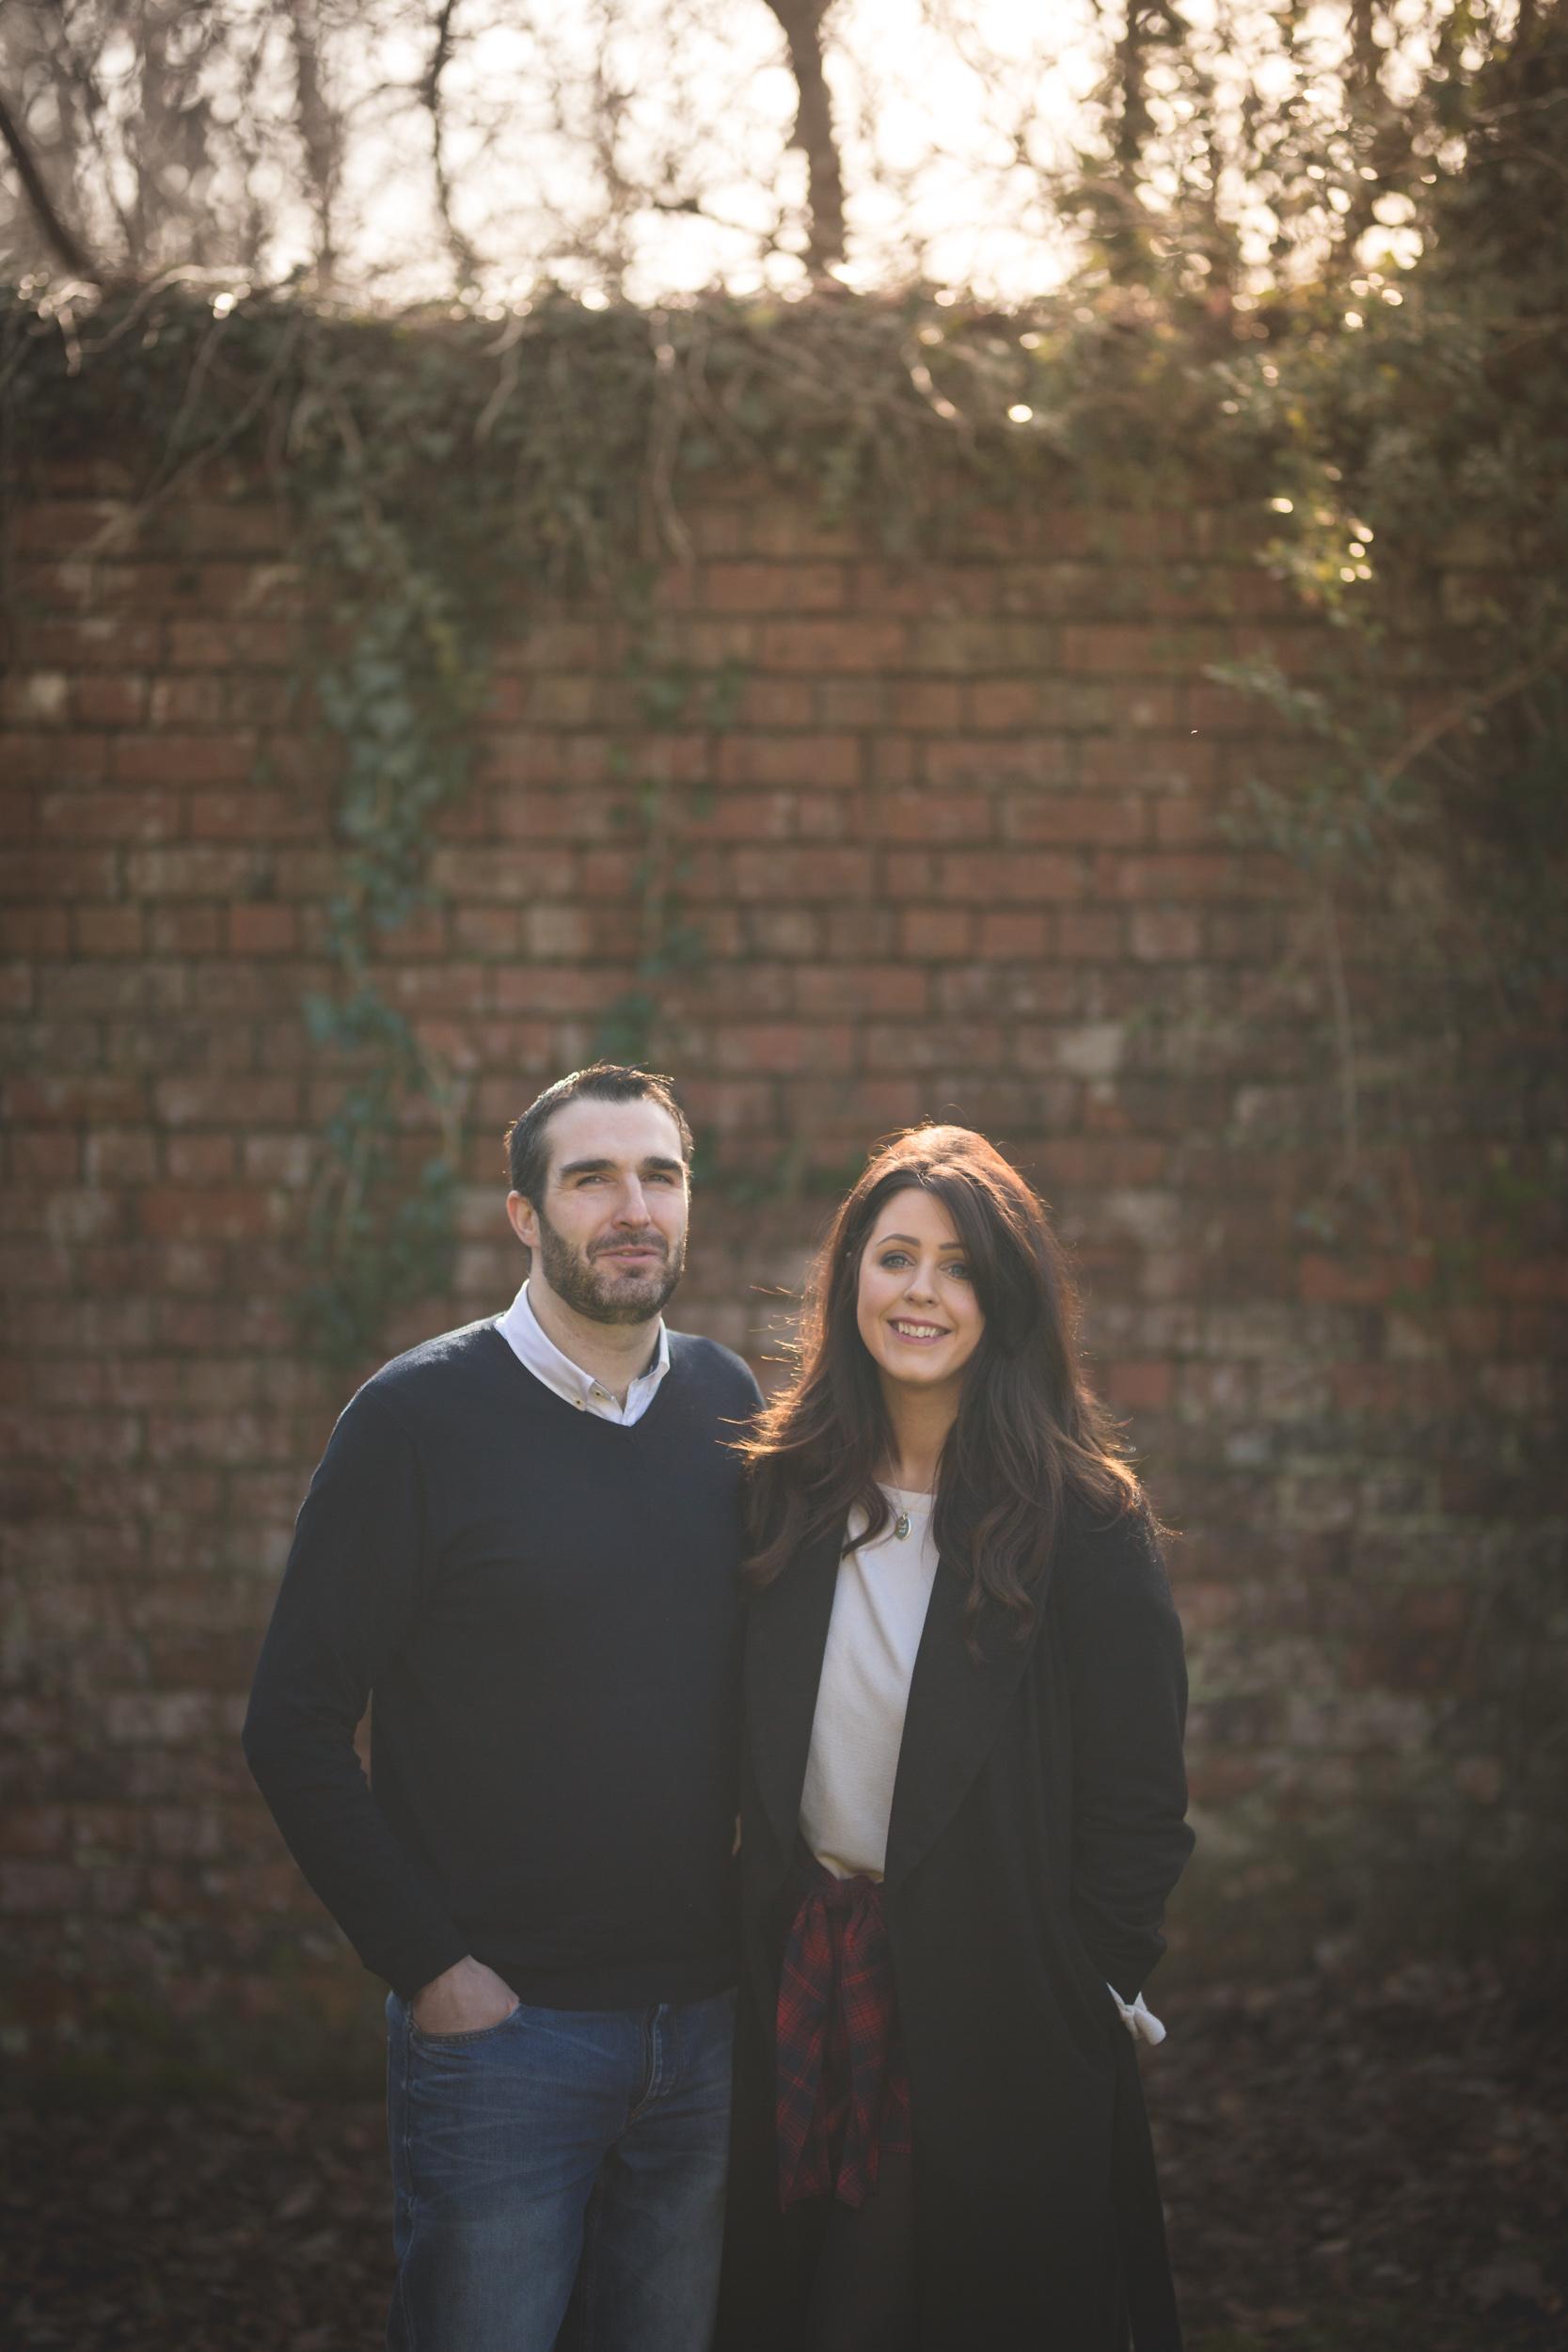 Oonagh & Francis Engagement-3.jpg